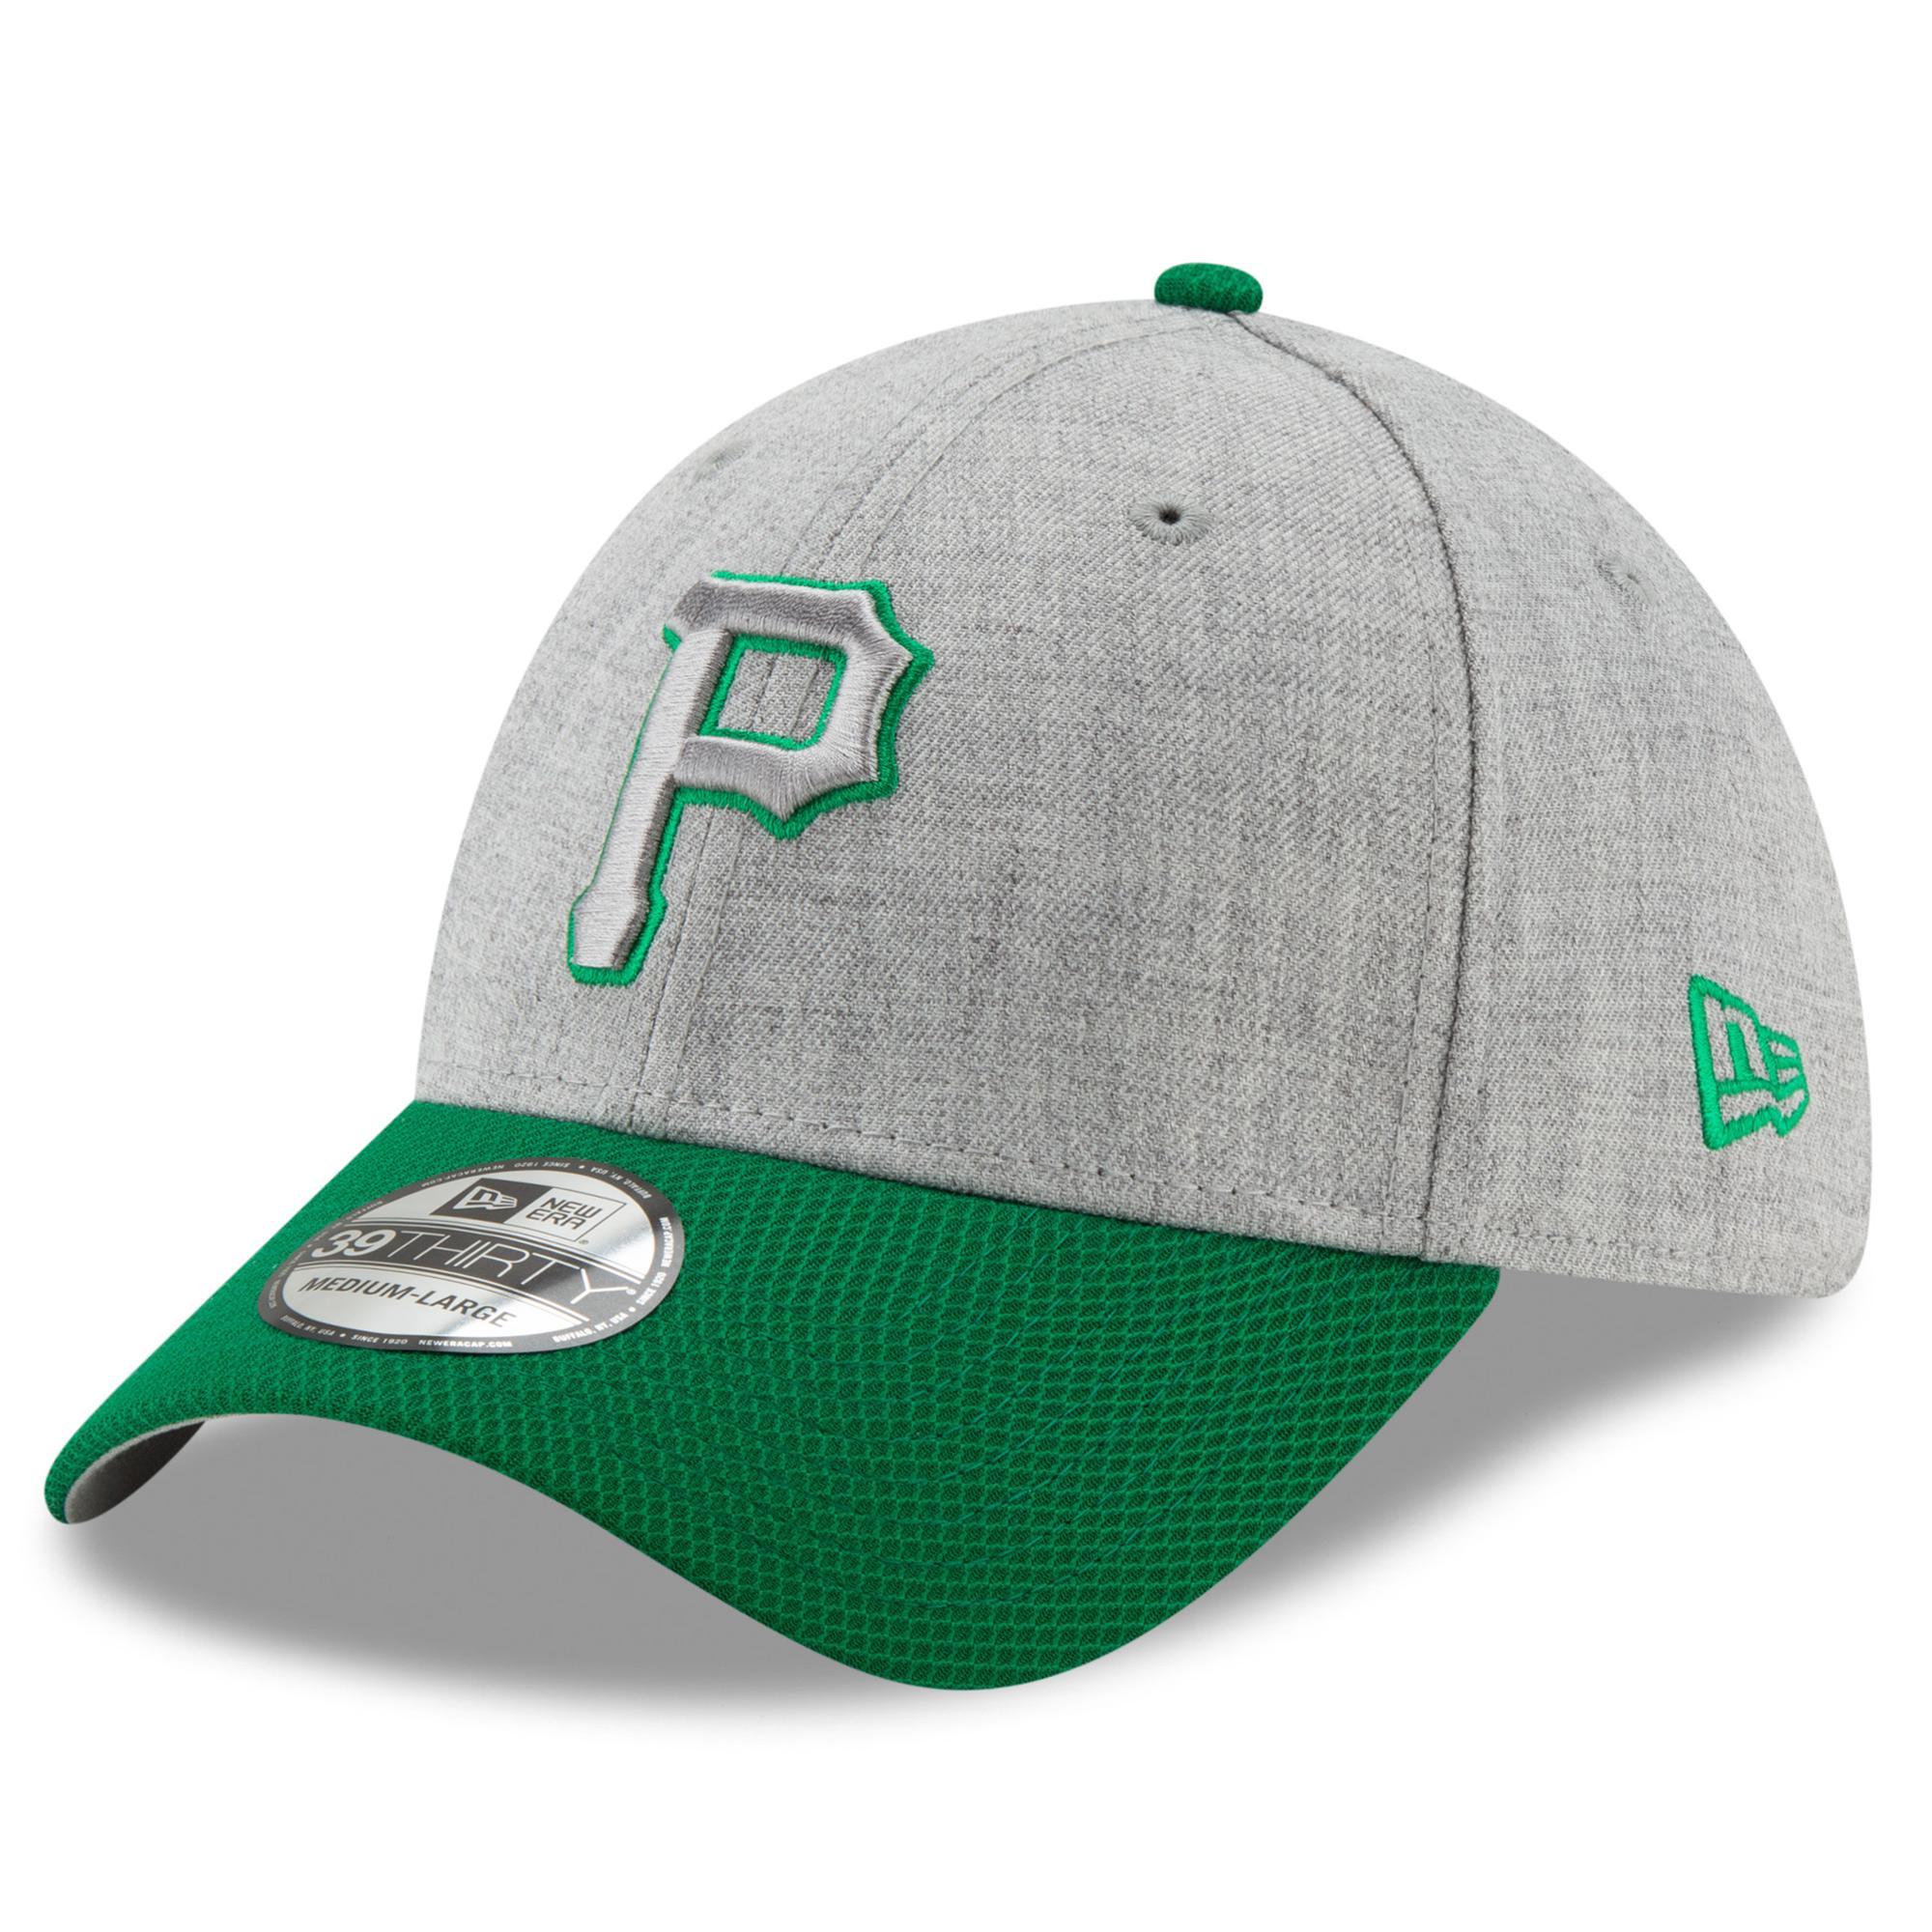 Pittsburgh Pirates New Era St. Patrick's Day Change Up Redux 39THIRTY Flex Hat - Gray/Green